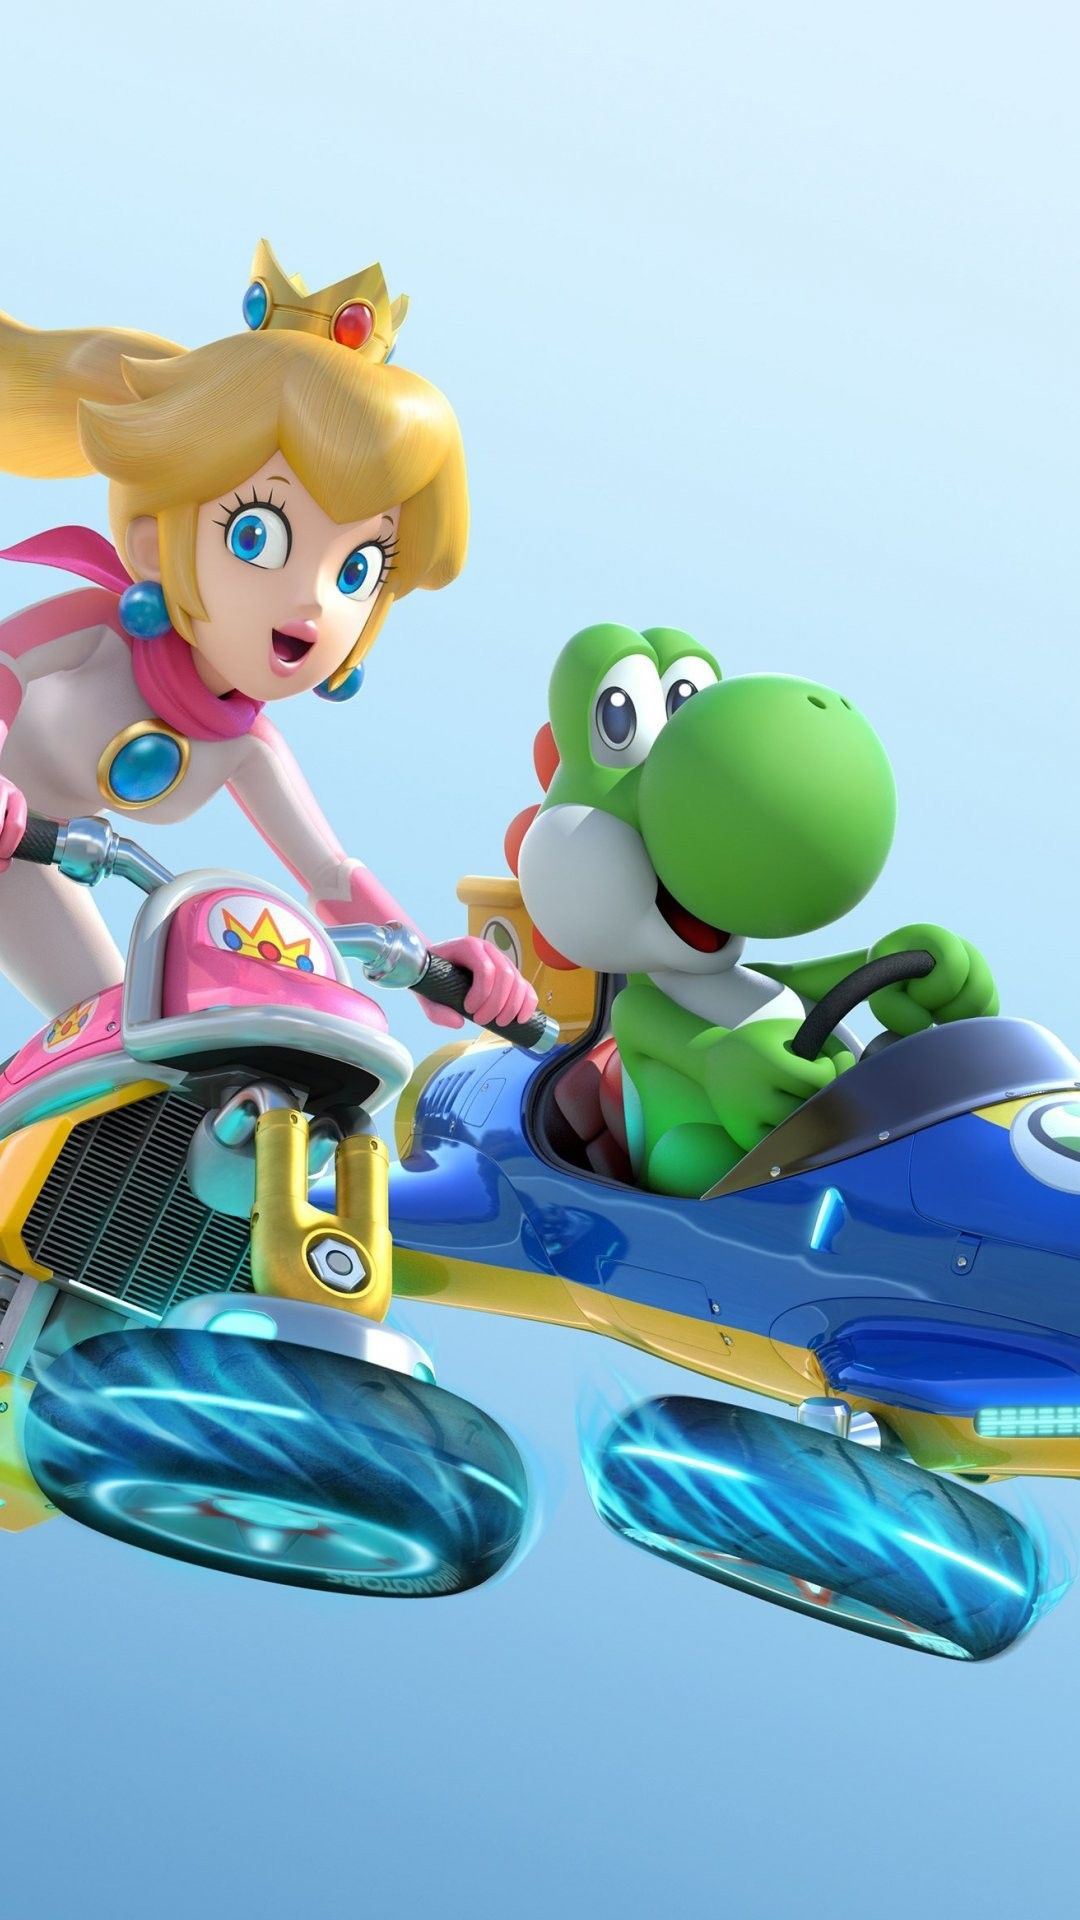 Mario Kart 8 iPhone 6 Plus Wallpaper 16097 Games iPhone